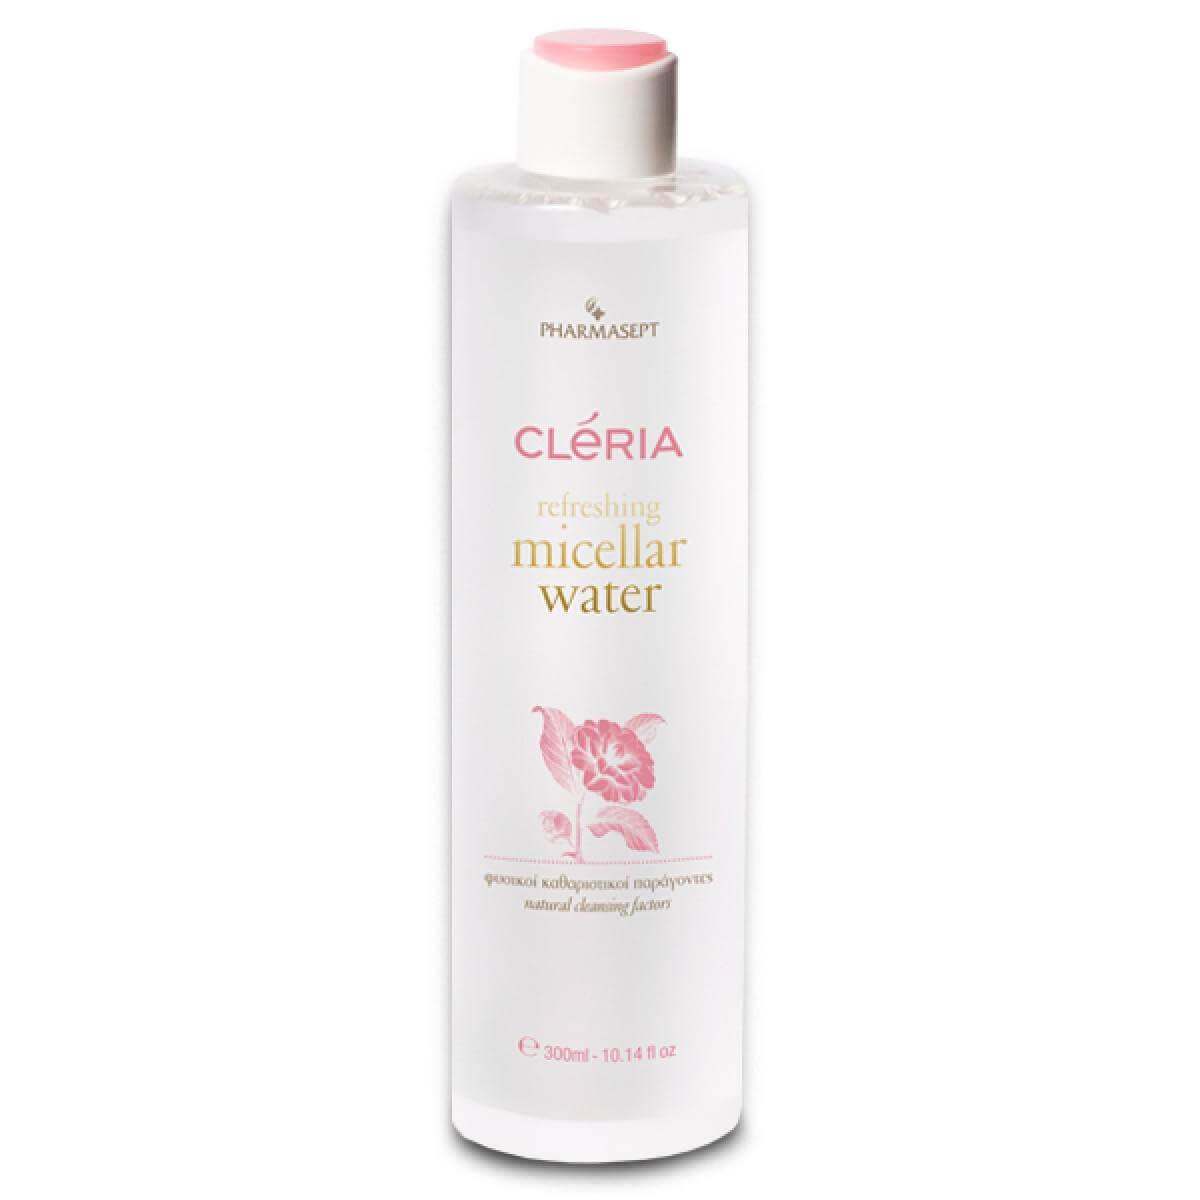 Pharmasept Cleria Refreshing Micellar Water Νερό Ντεμακιγιάζ για Πρόσωπο & ΜάτιαAll Skin Τypes 300ml